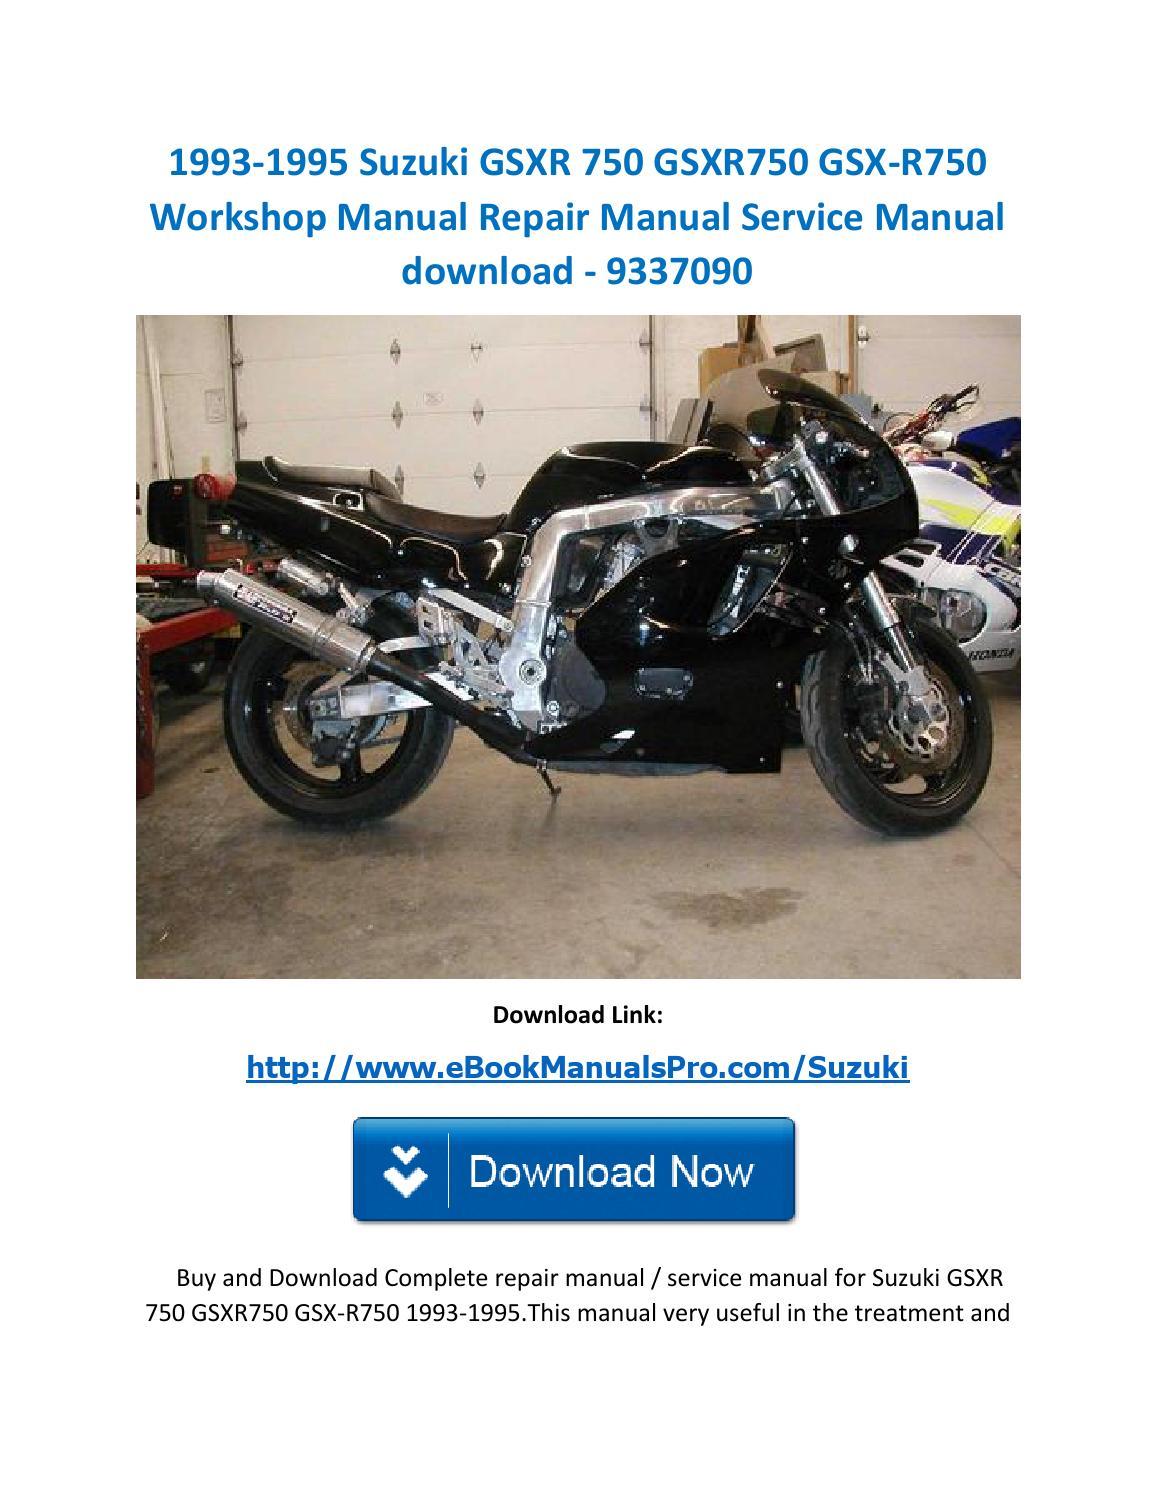 1993 1995 Suzuki Gsxr 750 Gsxr750 Gsx R750 Workshop Manual